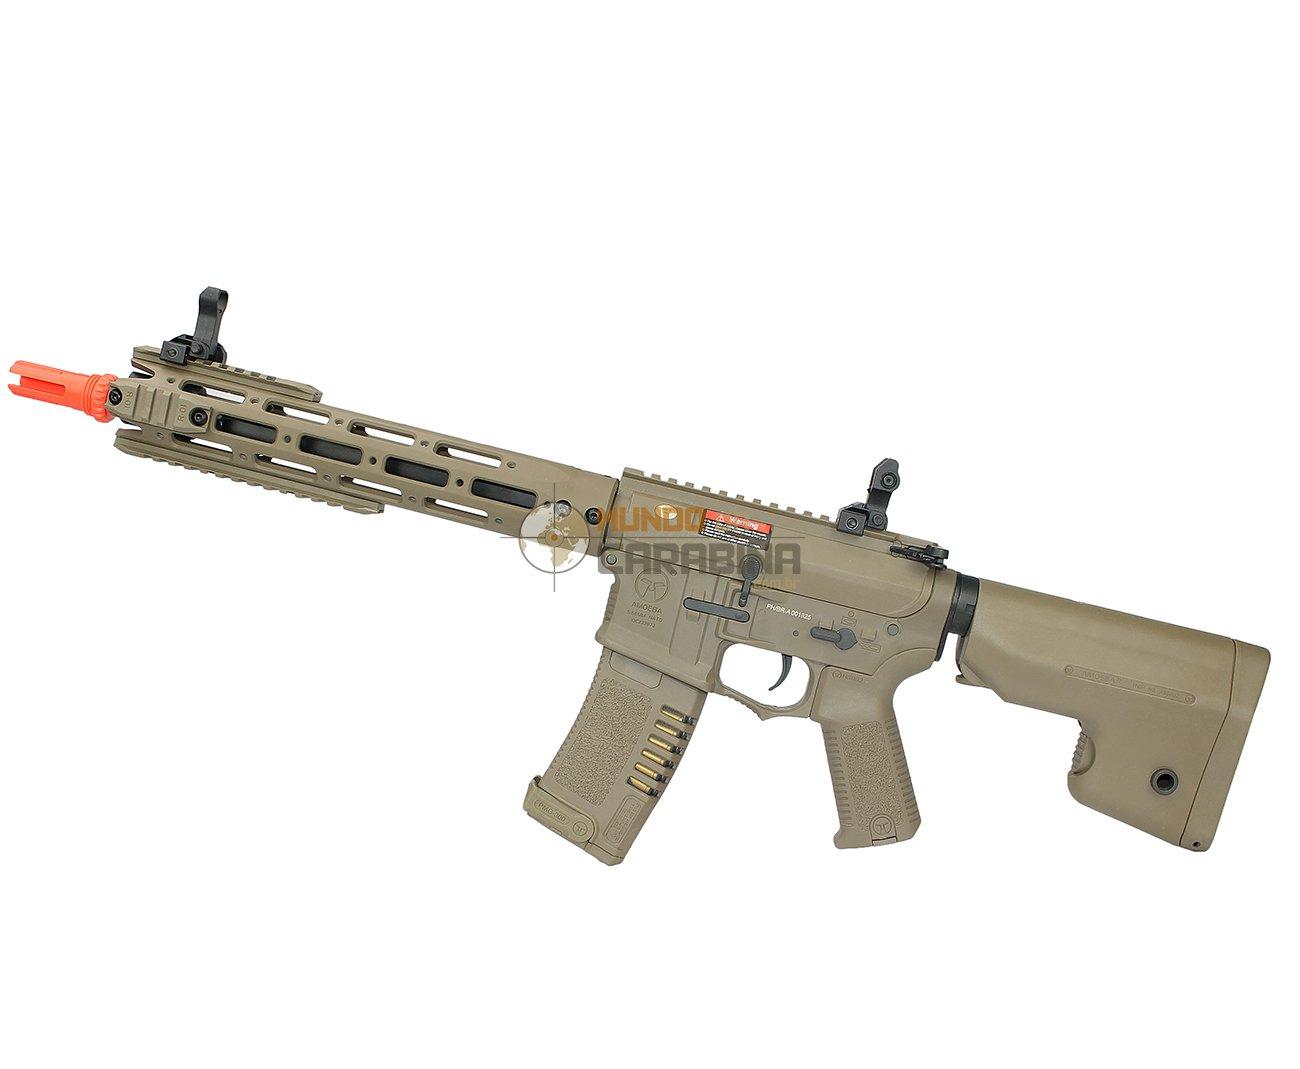 Rifle De Airsoft M4 Ris Long Amoeba Am-009-de - Cal 6.0mm - Ares